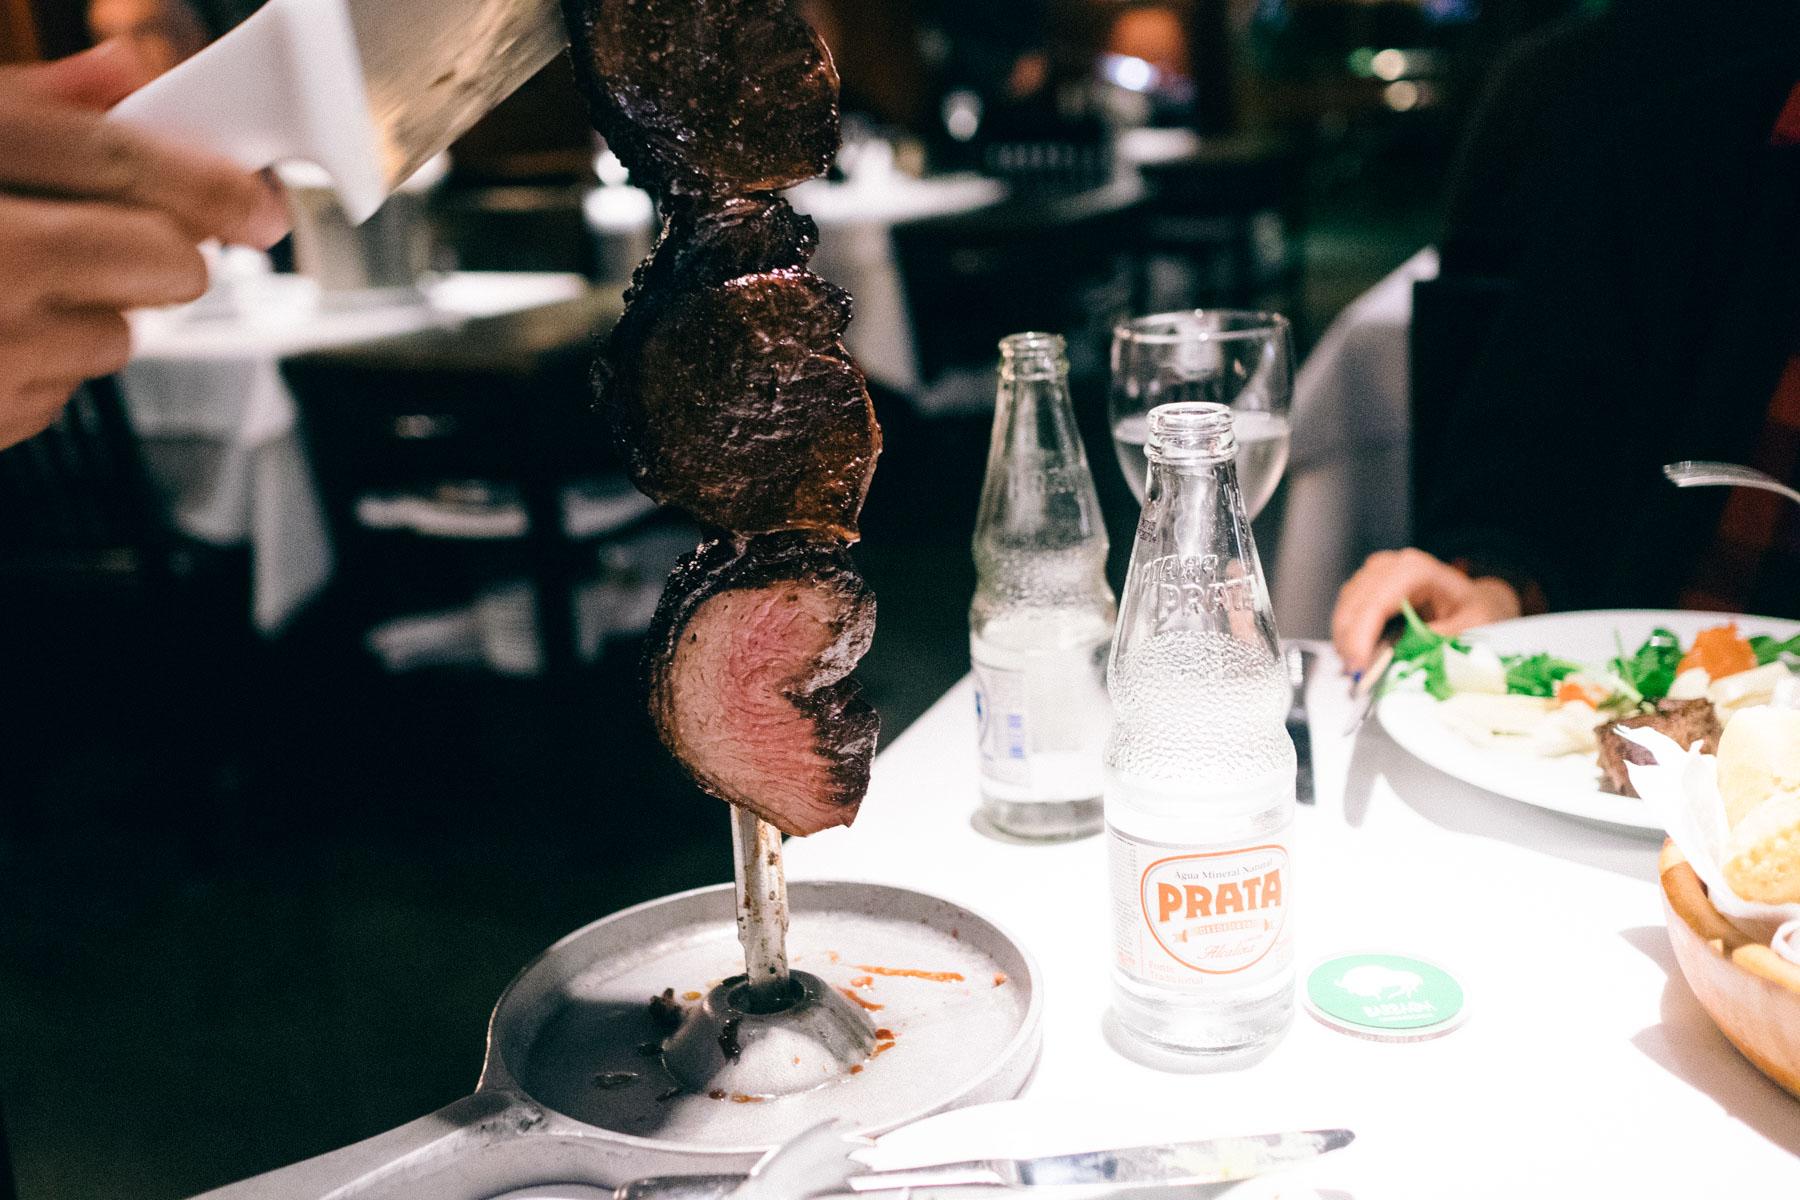 sao-paulo-brasil-restaurants-barbacoa-brazilian-barbecue-bbq-rodizio-6